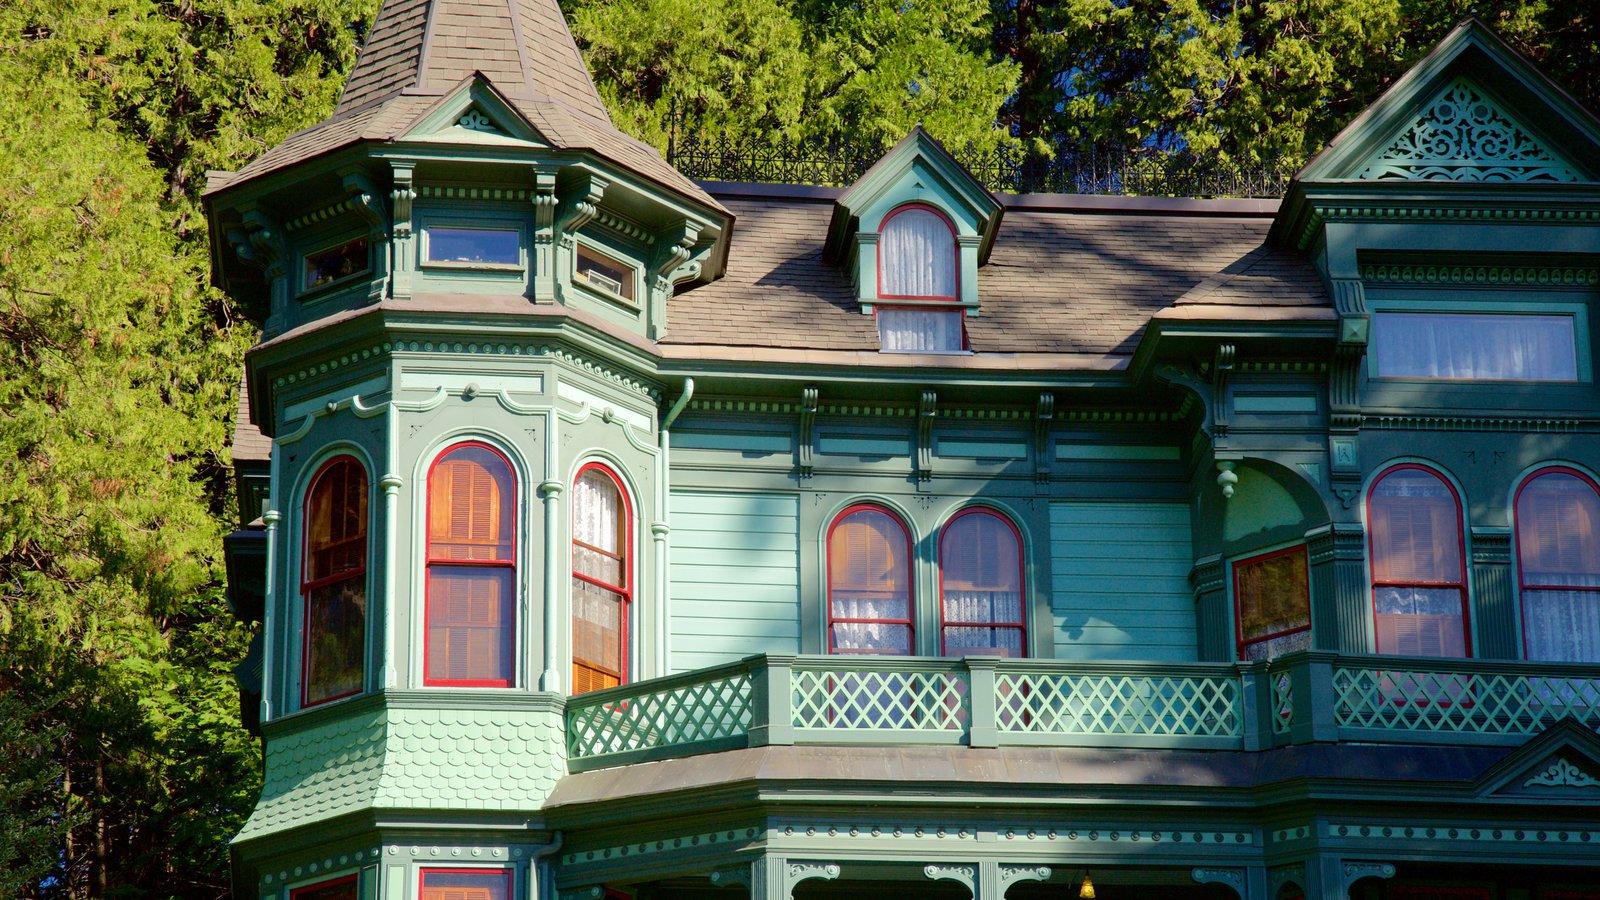 Shelton-McMurphey-Johnson House ofreciendo una casa